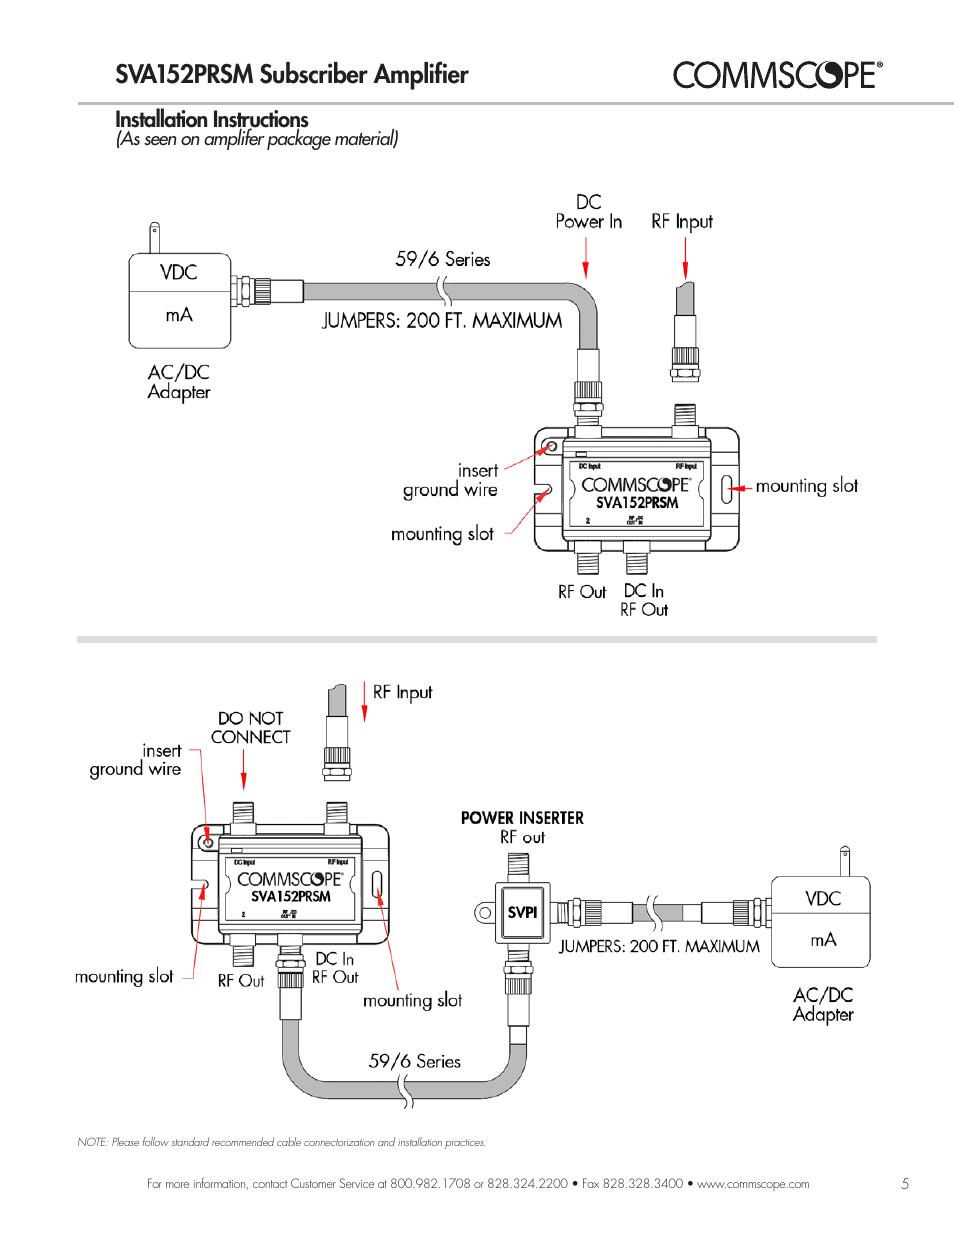 Bose Amplifier Connector Details Manual Guide